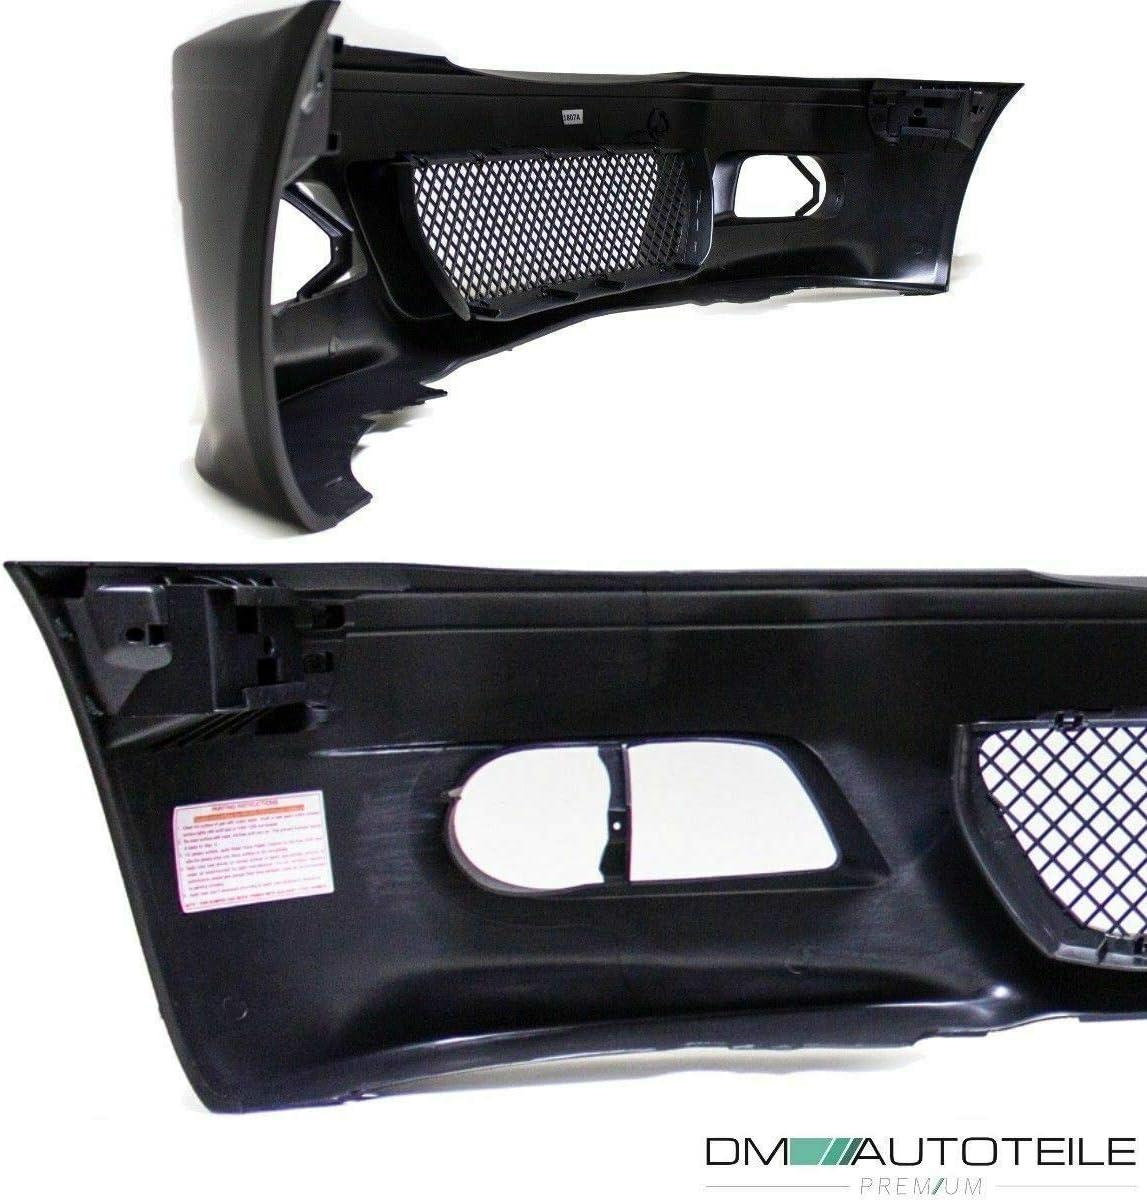 DM Autoteile Coupe Cabrio Front Sto/ßstange Vorne passt f/ür E46 99-03 NSW Chrom f/ür M3